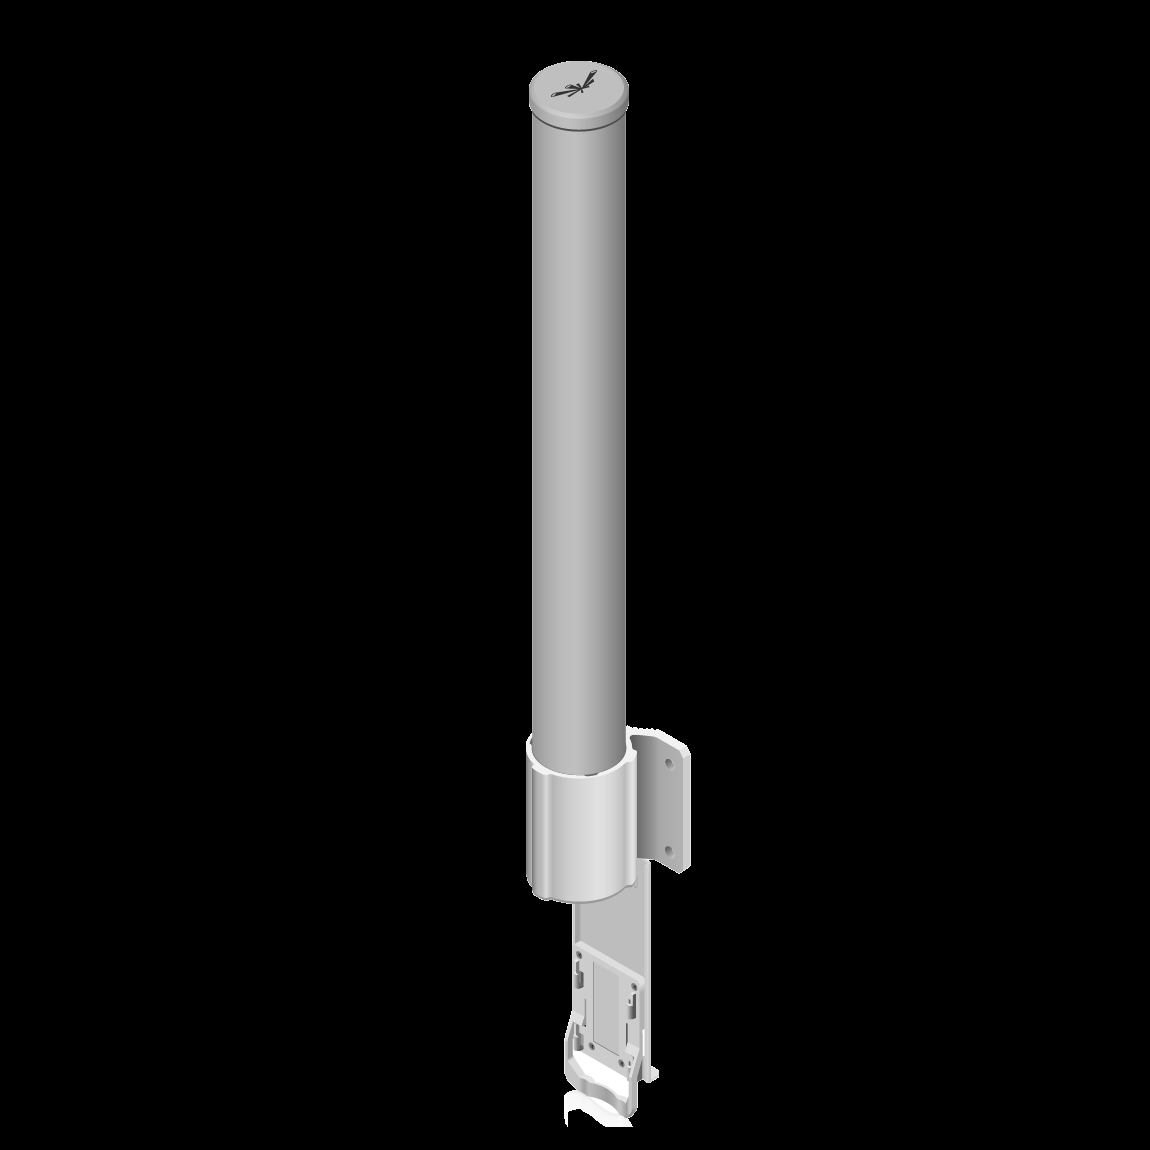 AMO-2G10 Ubiquiti 2.4 GHz AirMax 10dBi 360 Derece Omni Anten